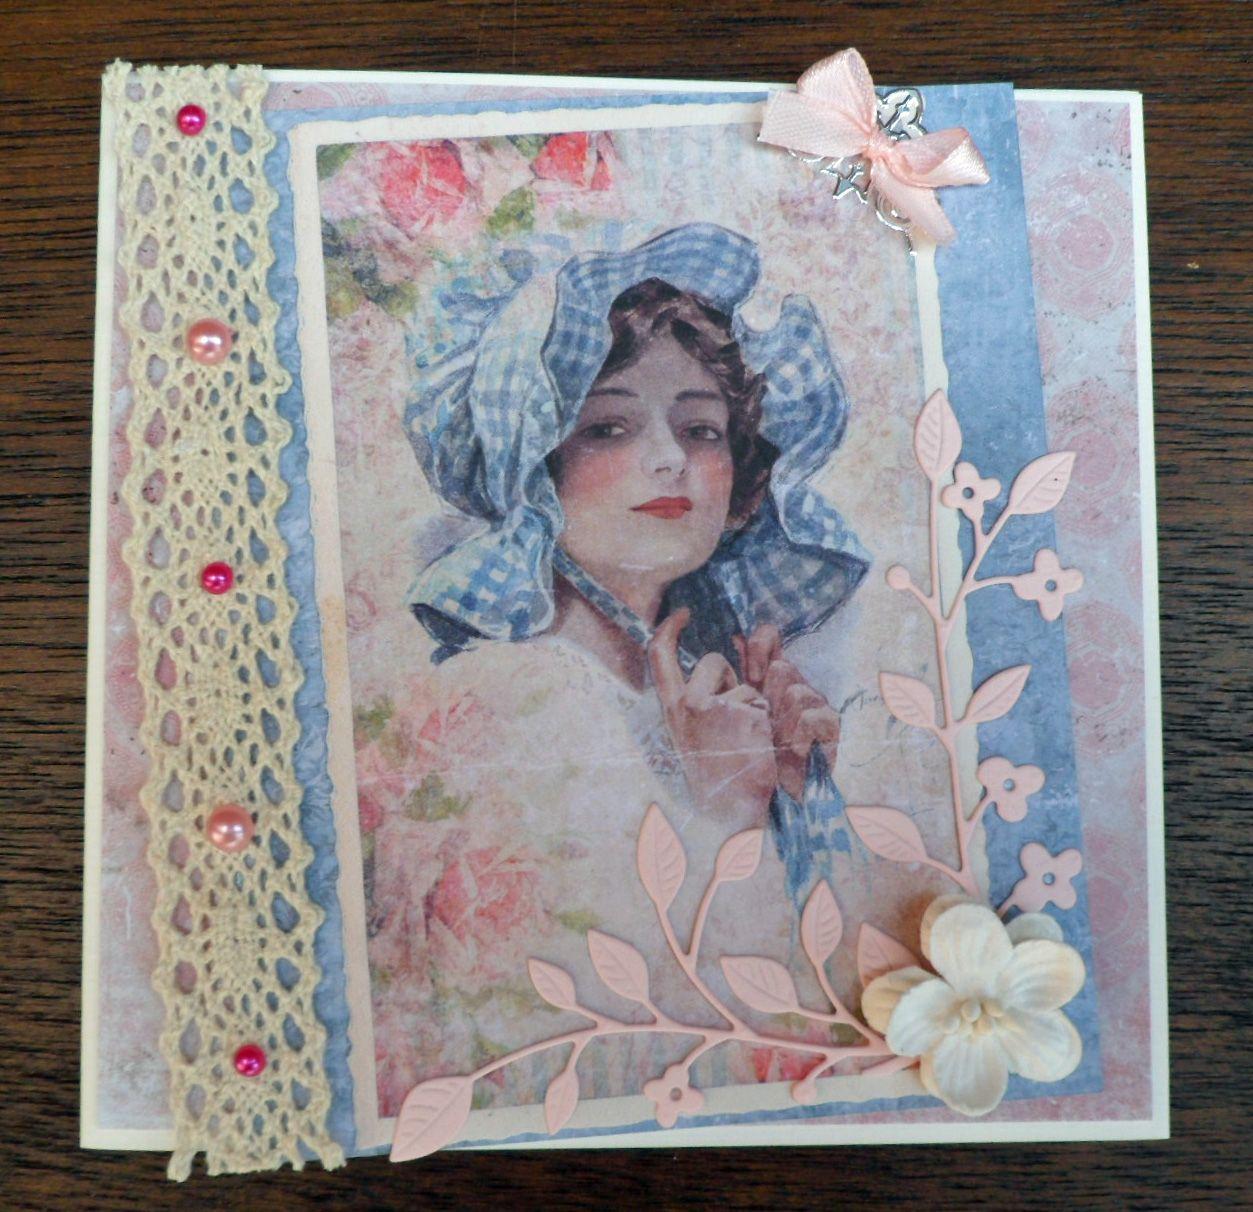 kaart van Romantic Portraits http://grietshobbykamer.blogspot.nl/